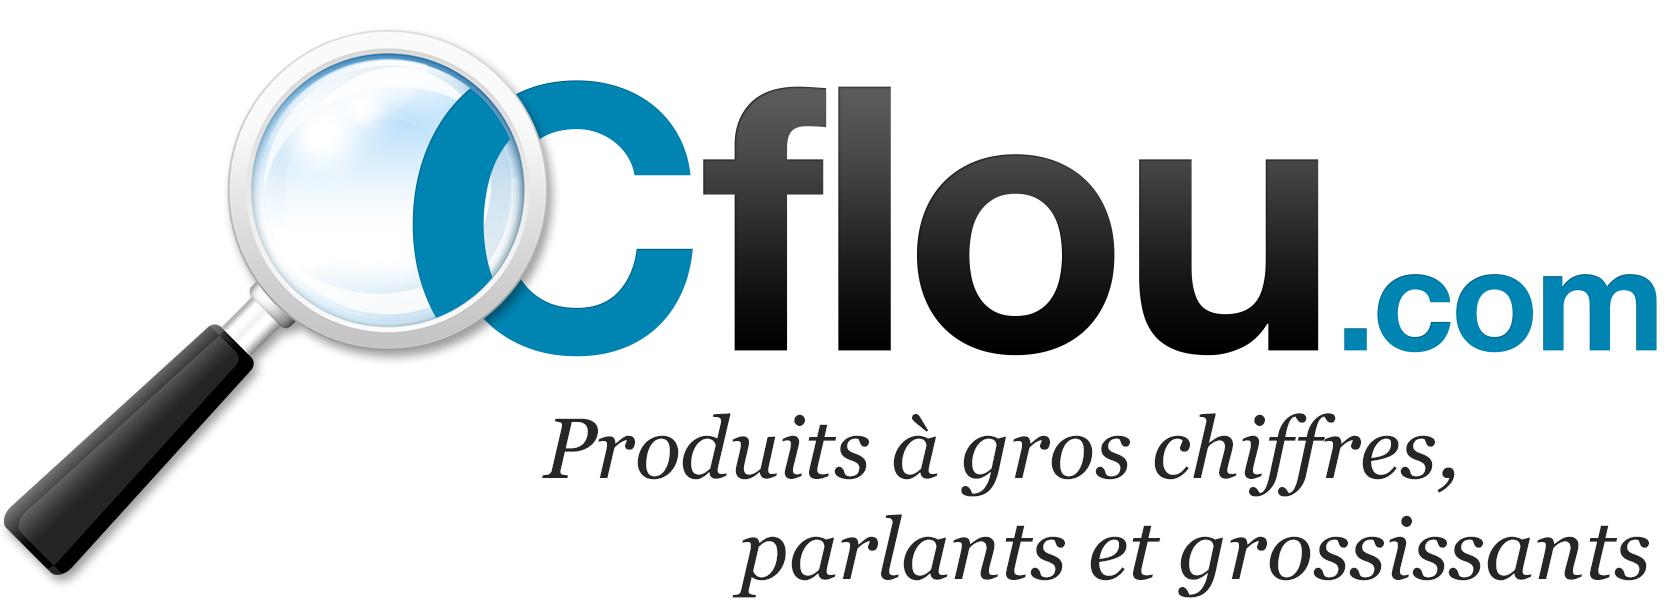 01_cflou_logo_hd_v3_fond-blanc